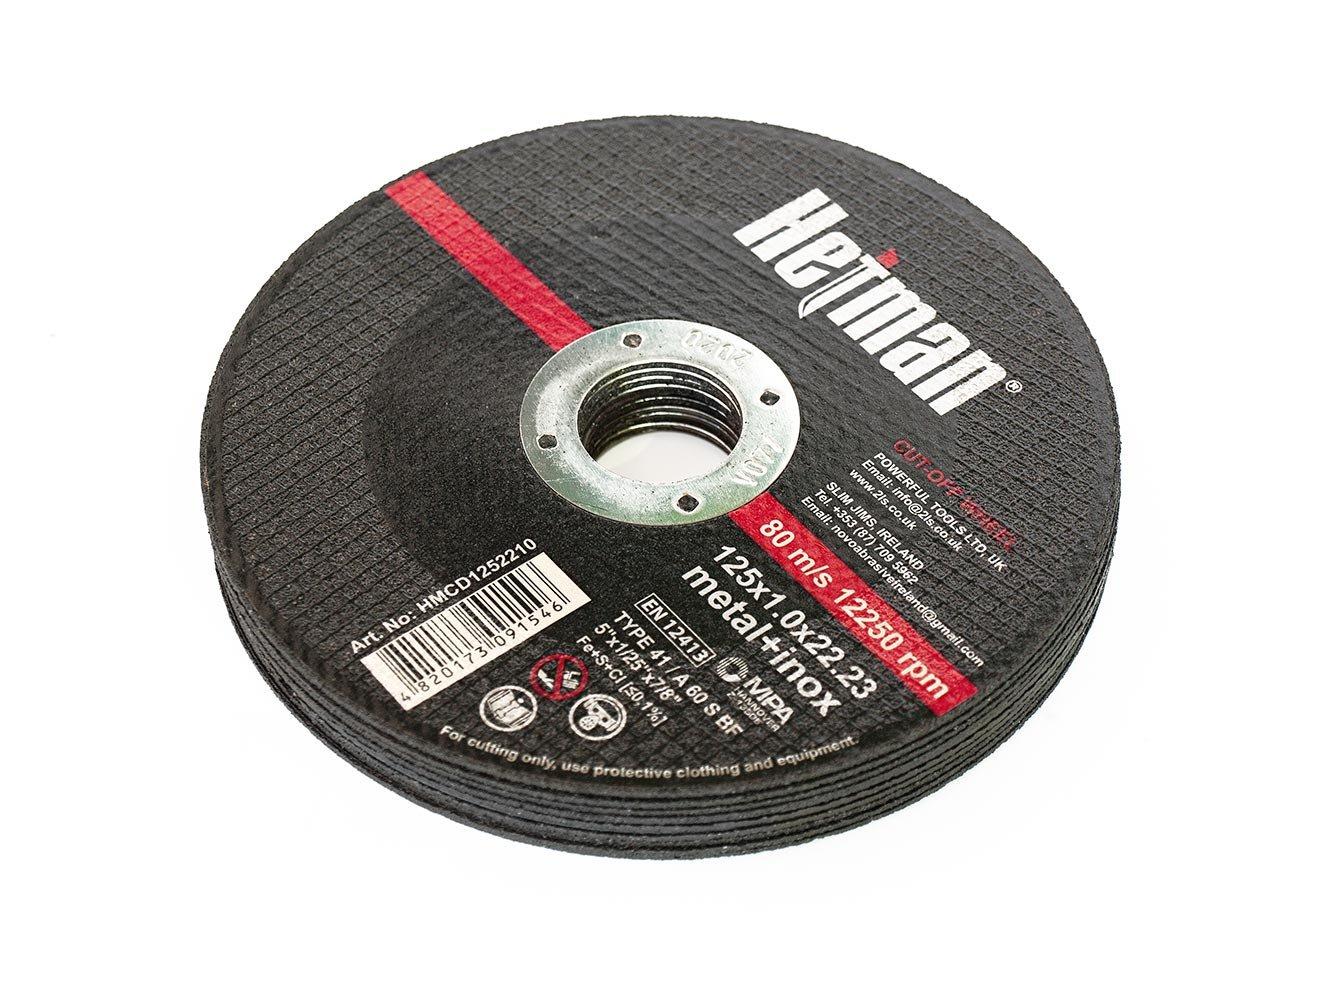 Disco de corte de metal 115 x 3 x 22,2 mm NOVOABRASIVE juego de 10 unidades